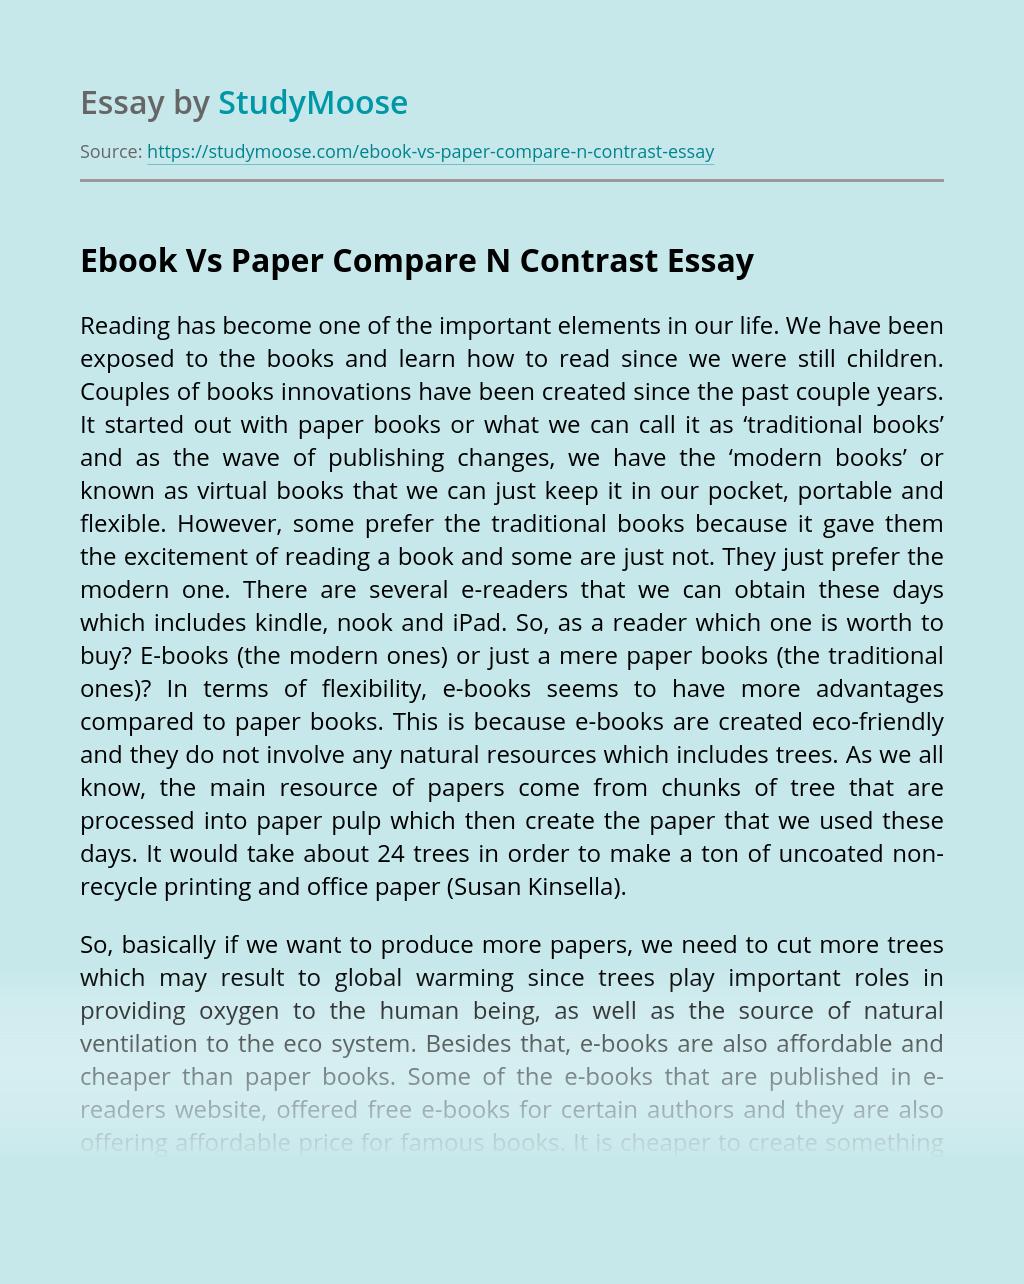 Ebook Vs Paper Compare N Contrast